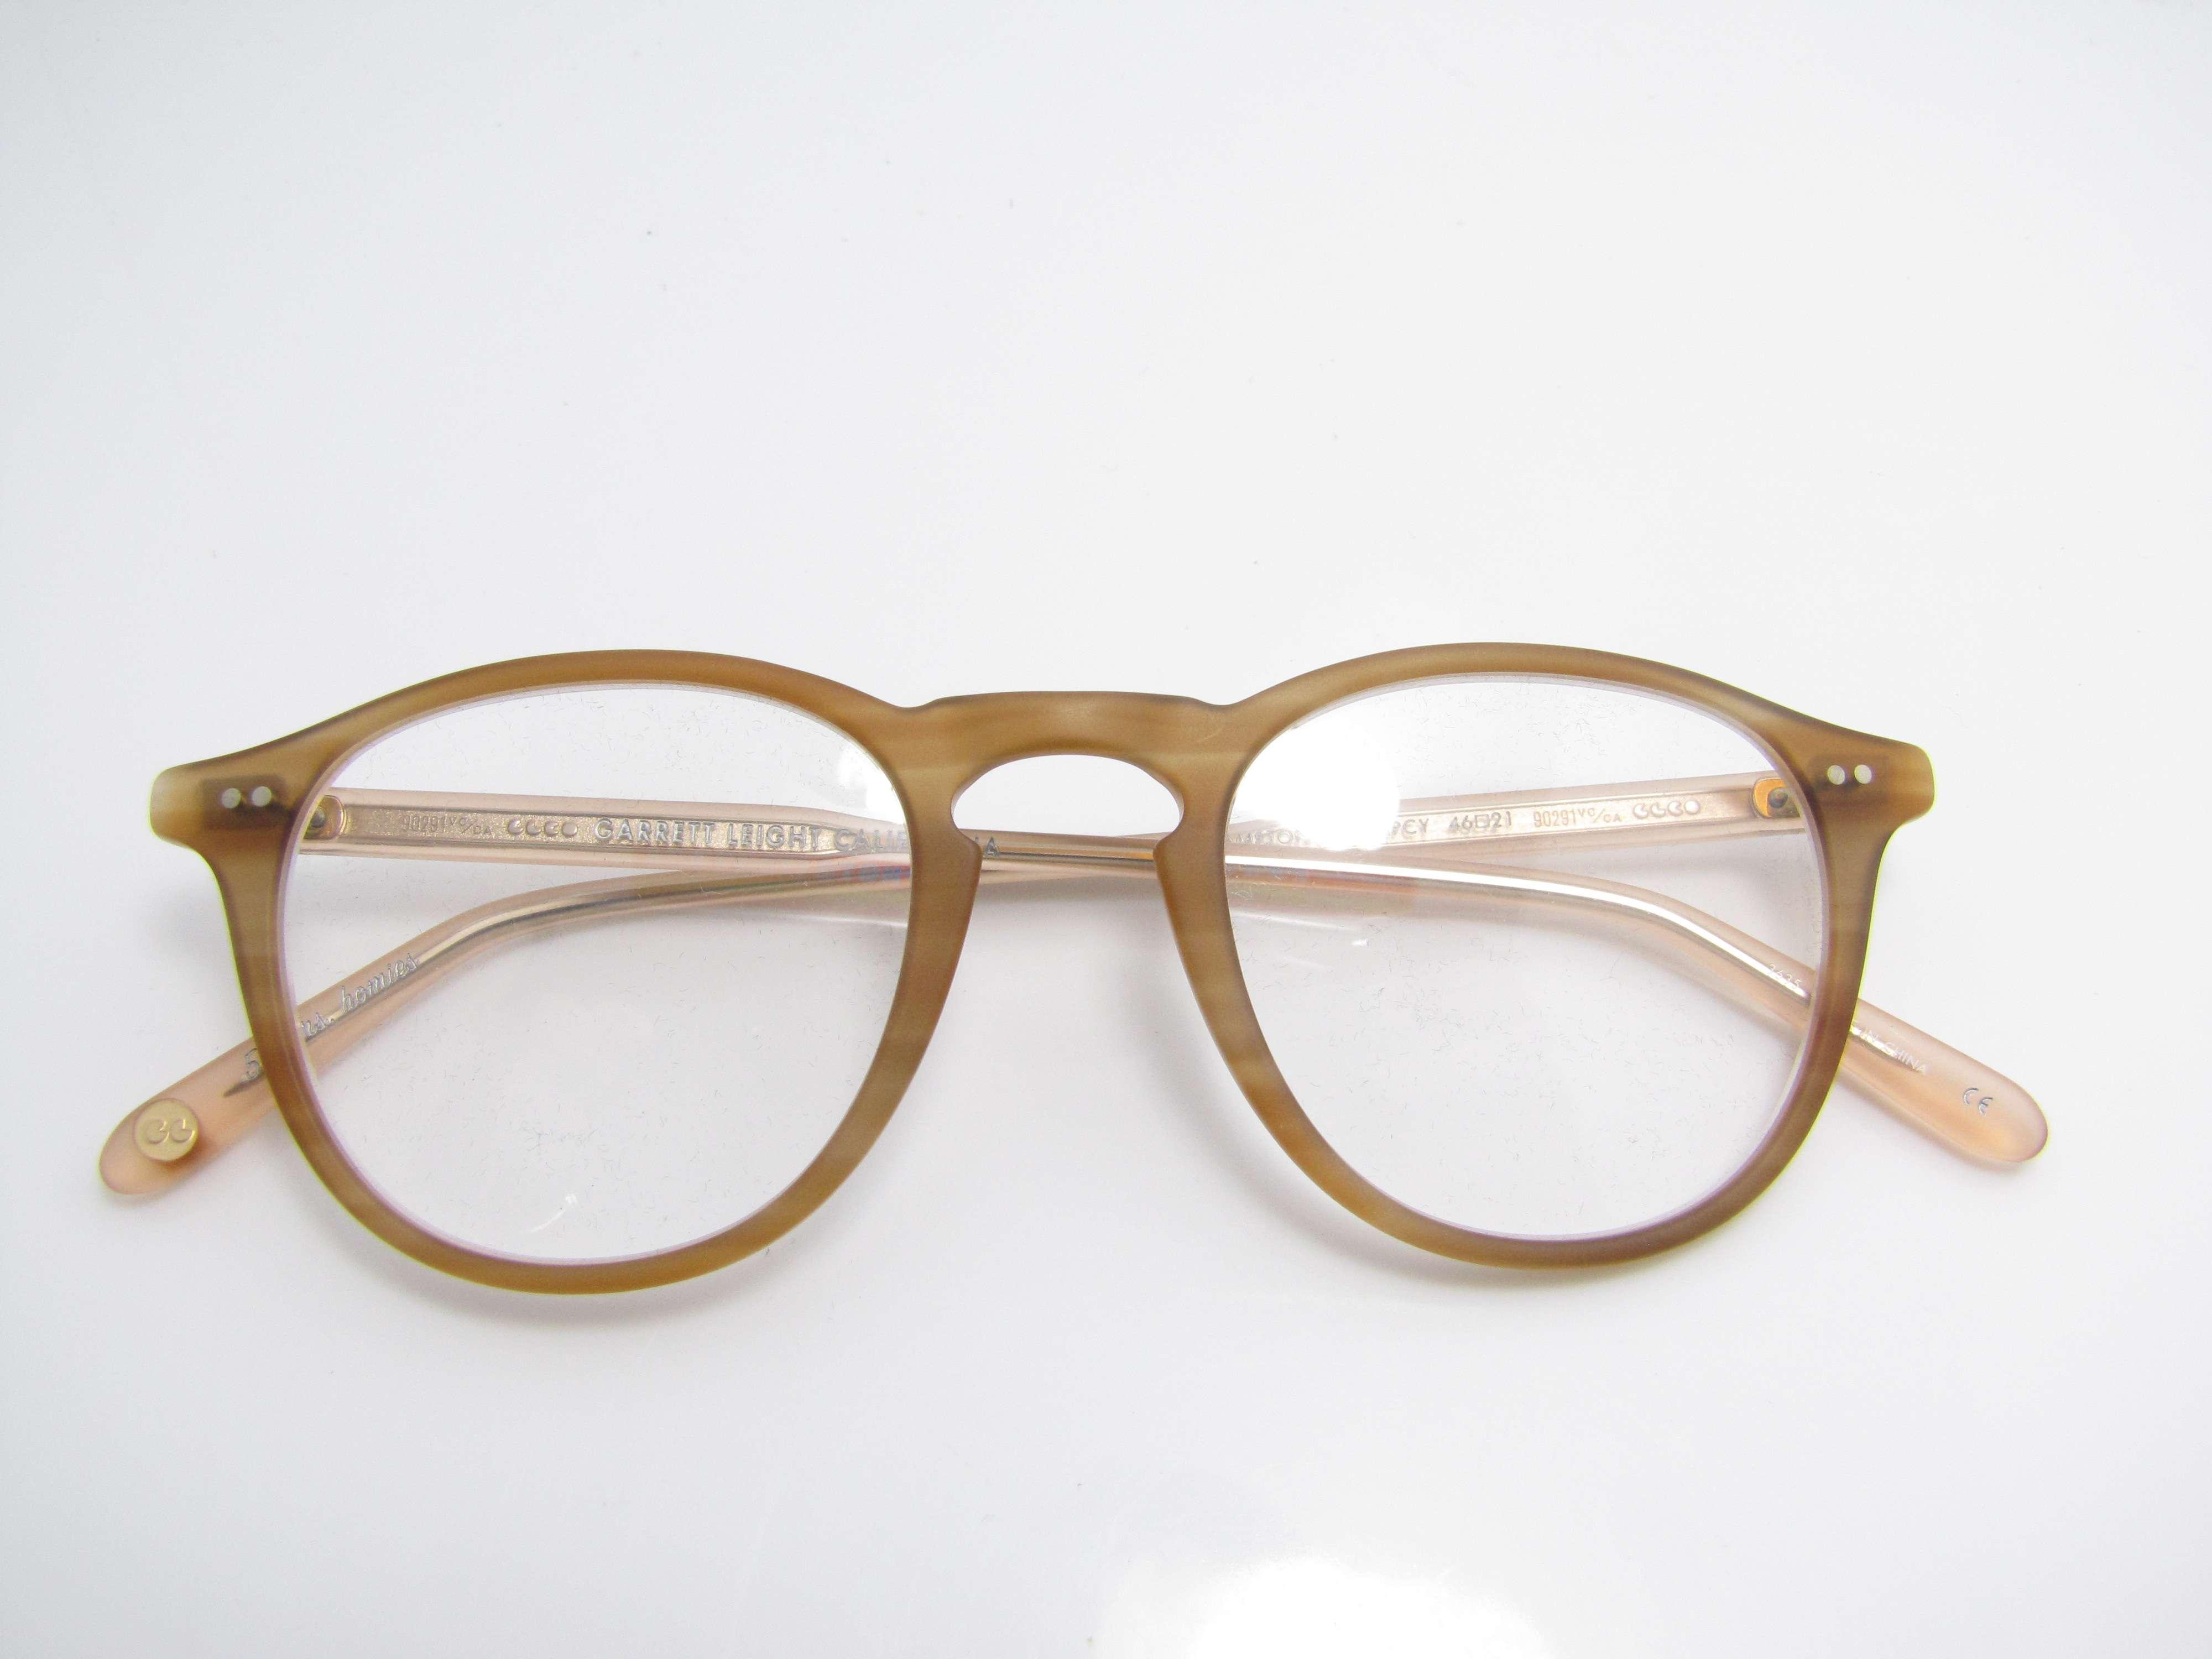 Garrett Leight California Eyeglasses New Eyewear Genuine ...